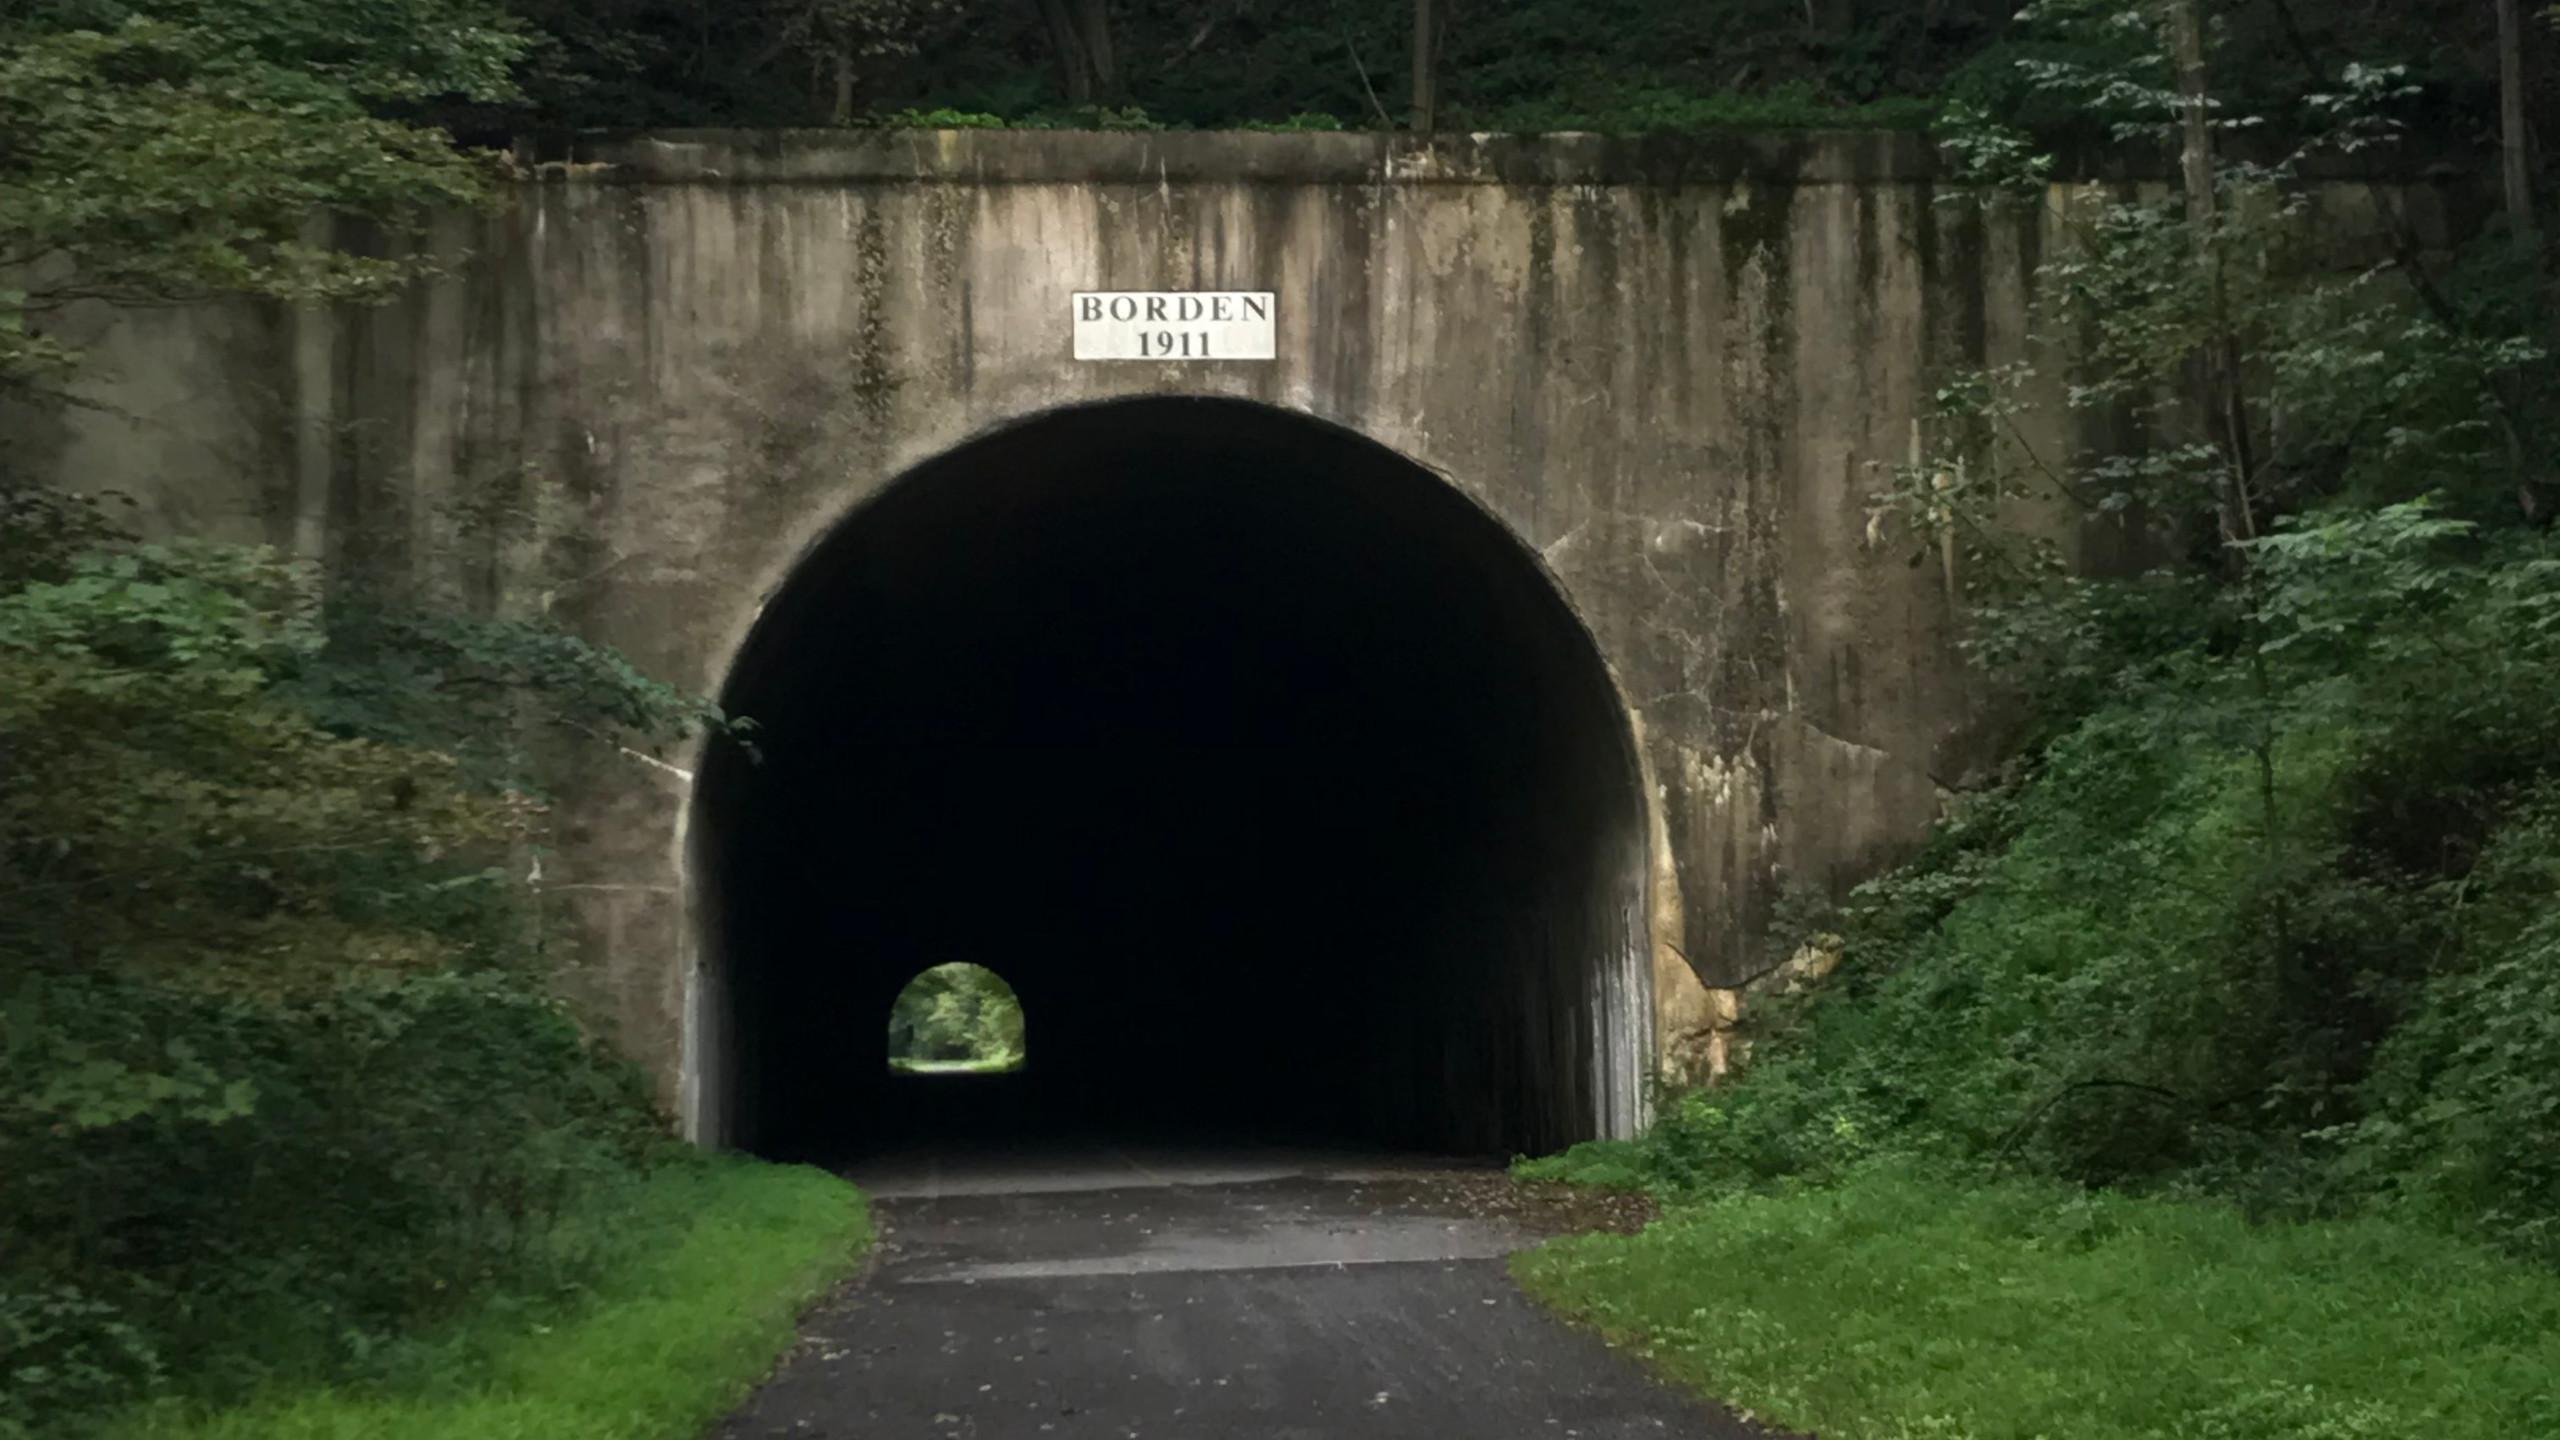 Borden Tunnel